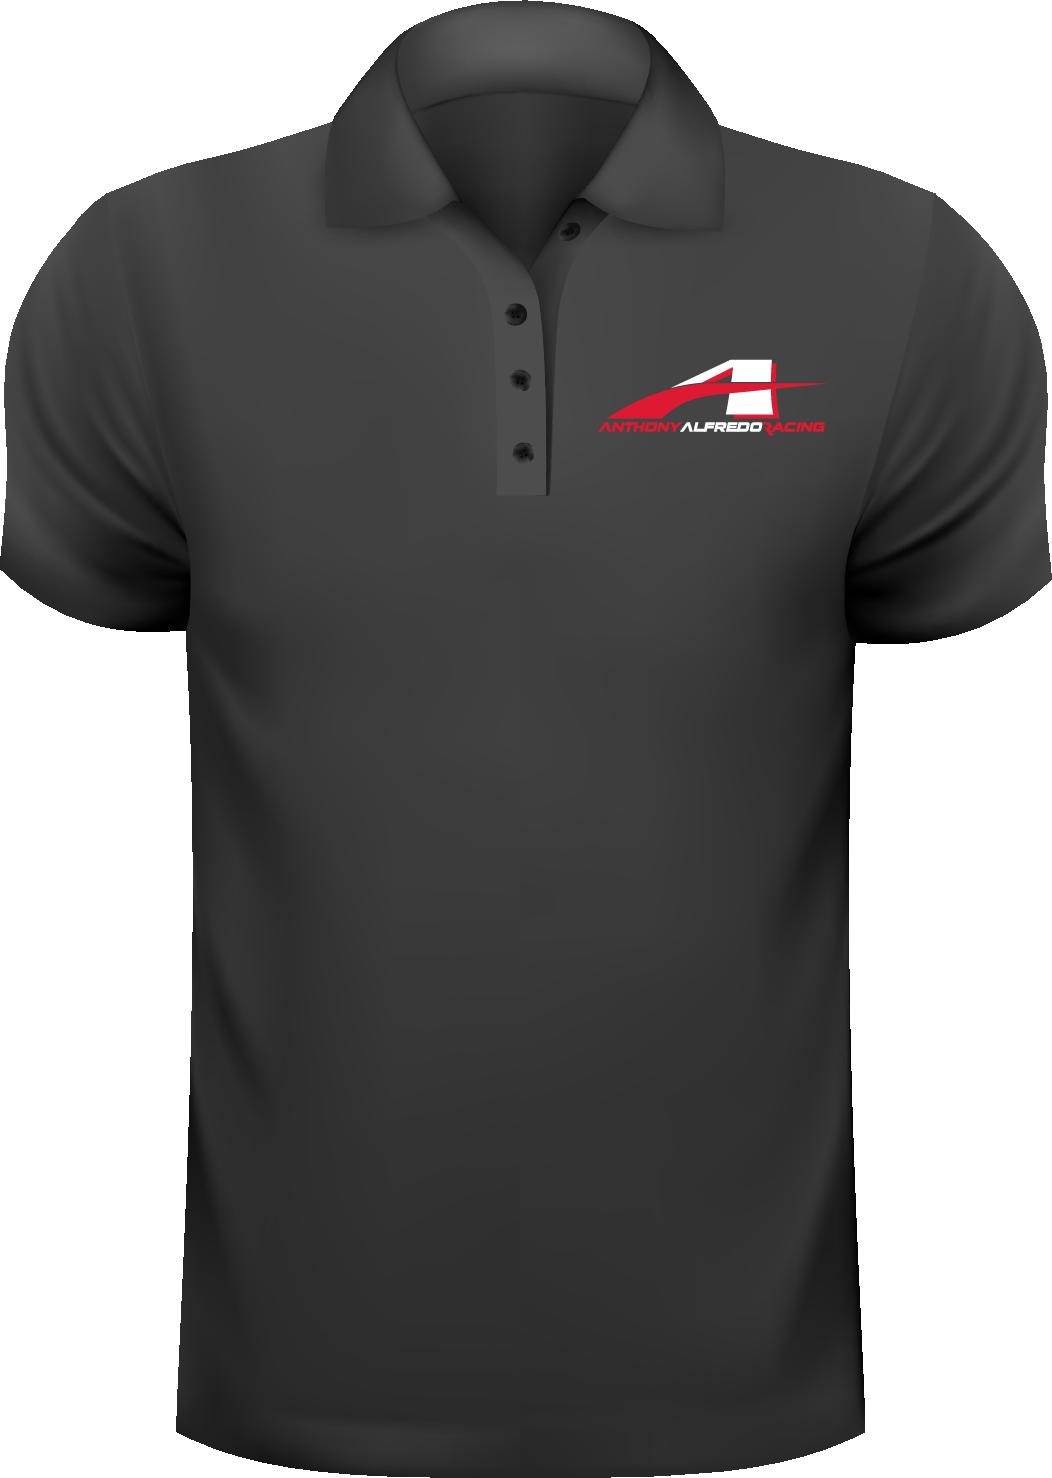 Anthony Alfredo Embroidered Polo Shirt